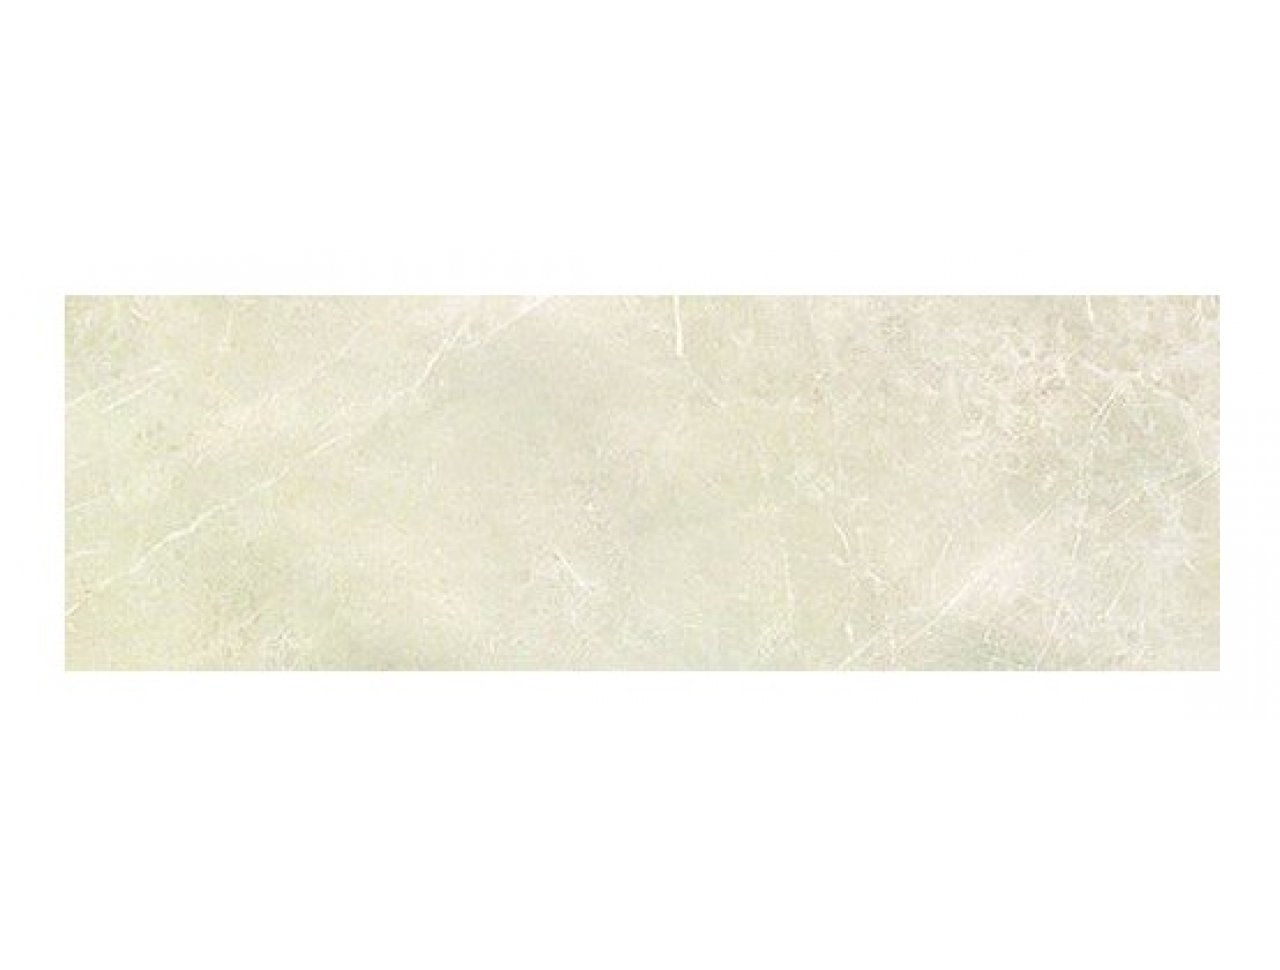 Настенная плитка FAP Roma Pietra 75 x 25 см, Арт. fLSQ